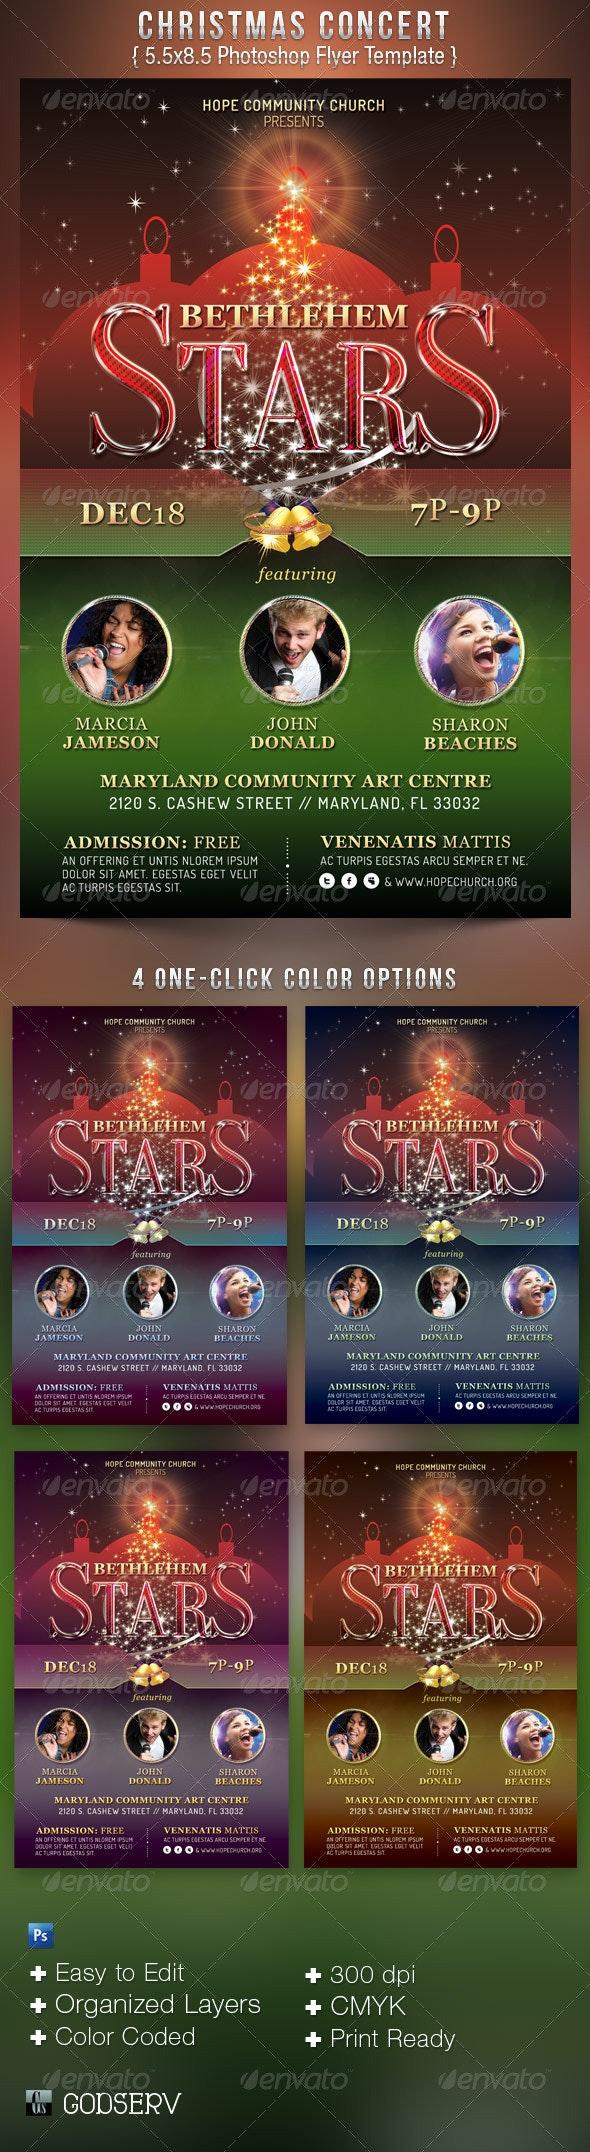 Christmas Concert Flyer Template - Church Flyers